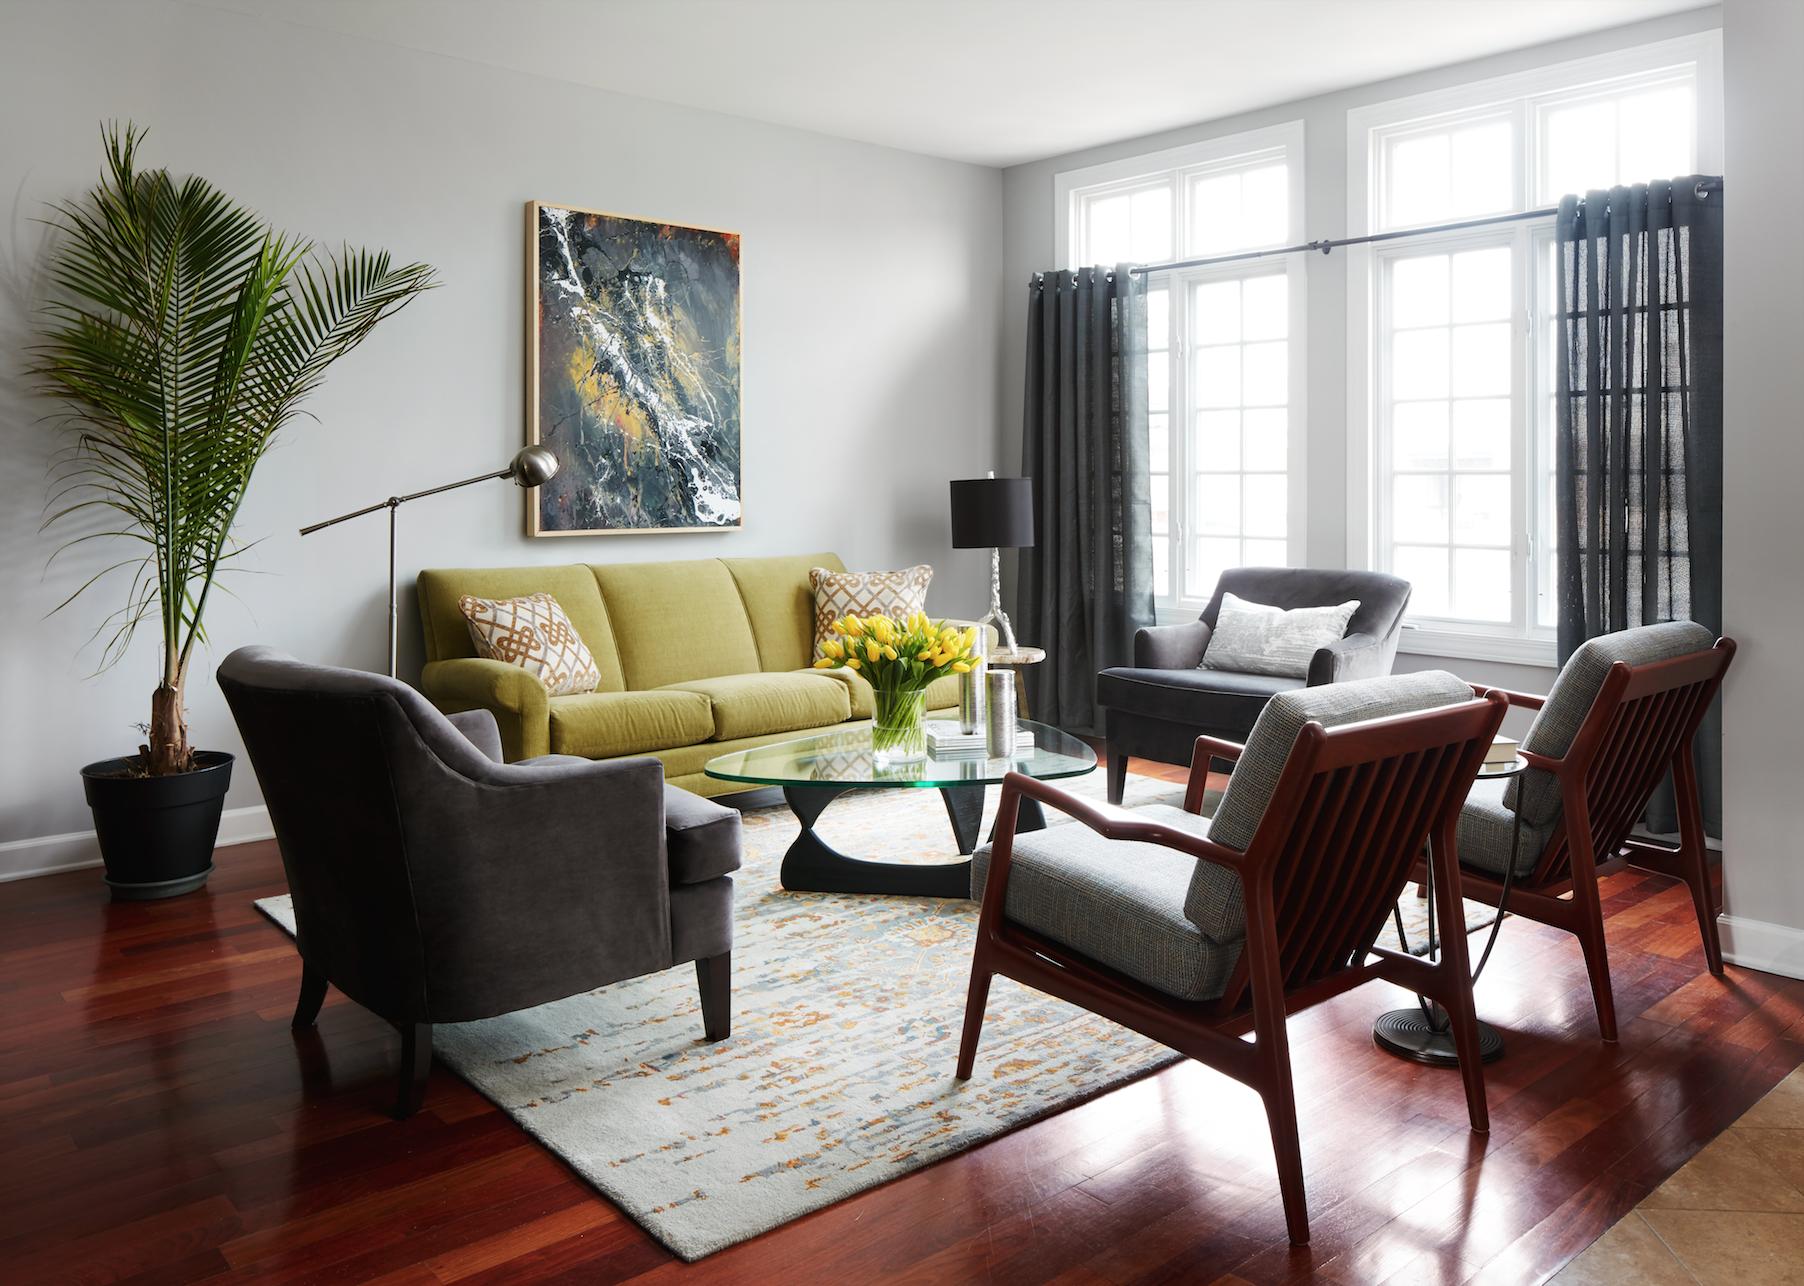 Copy of Living Room - Interior Design - Art Curation by Paula Interiors